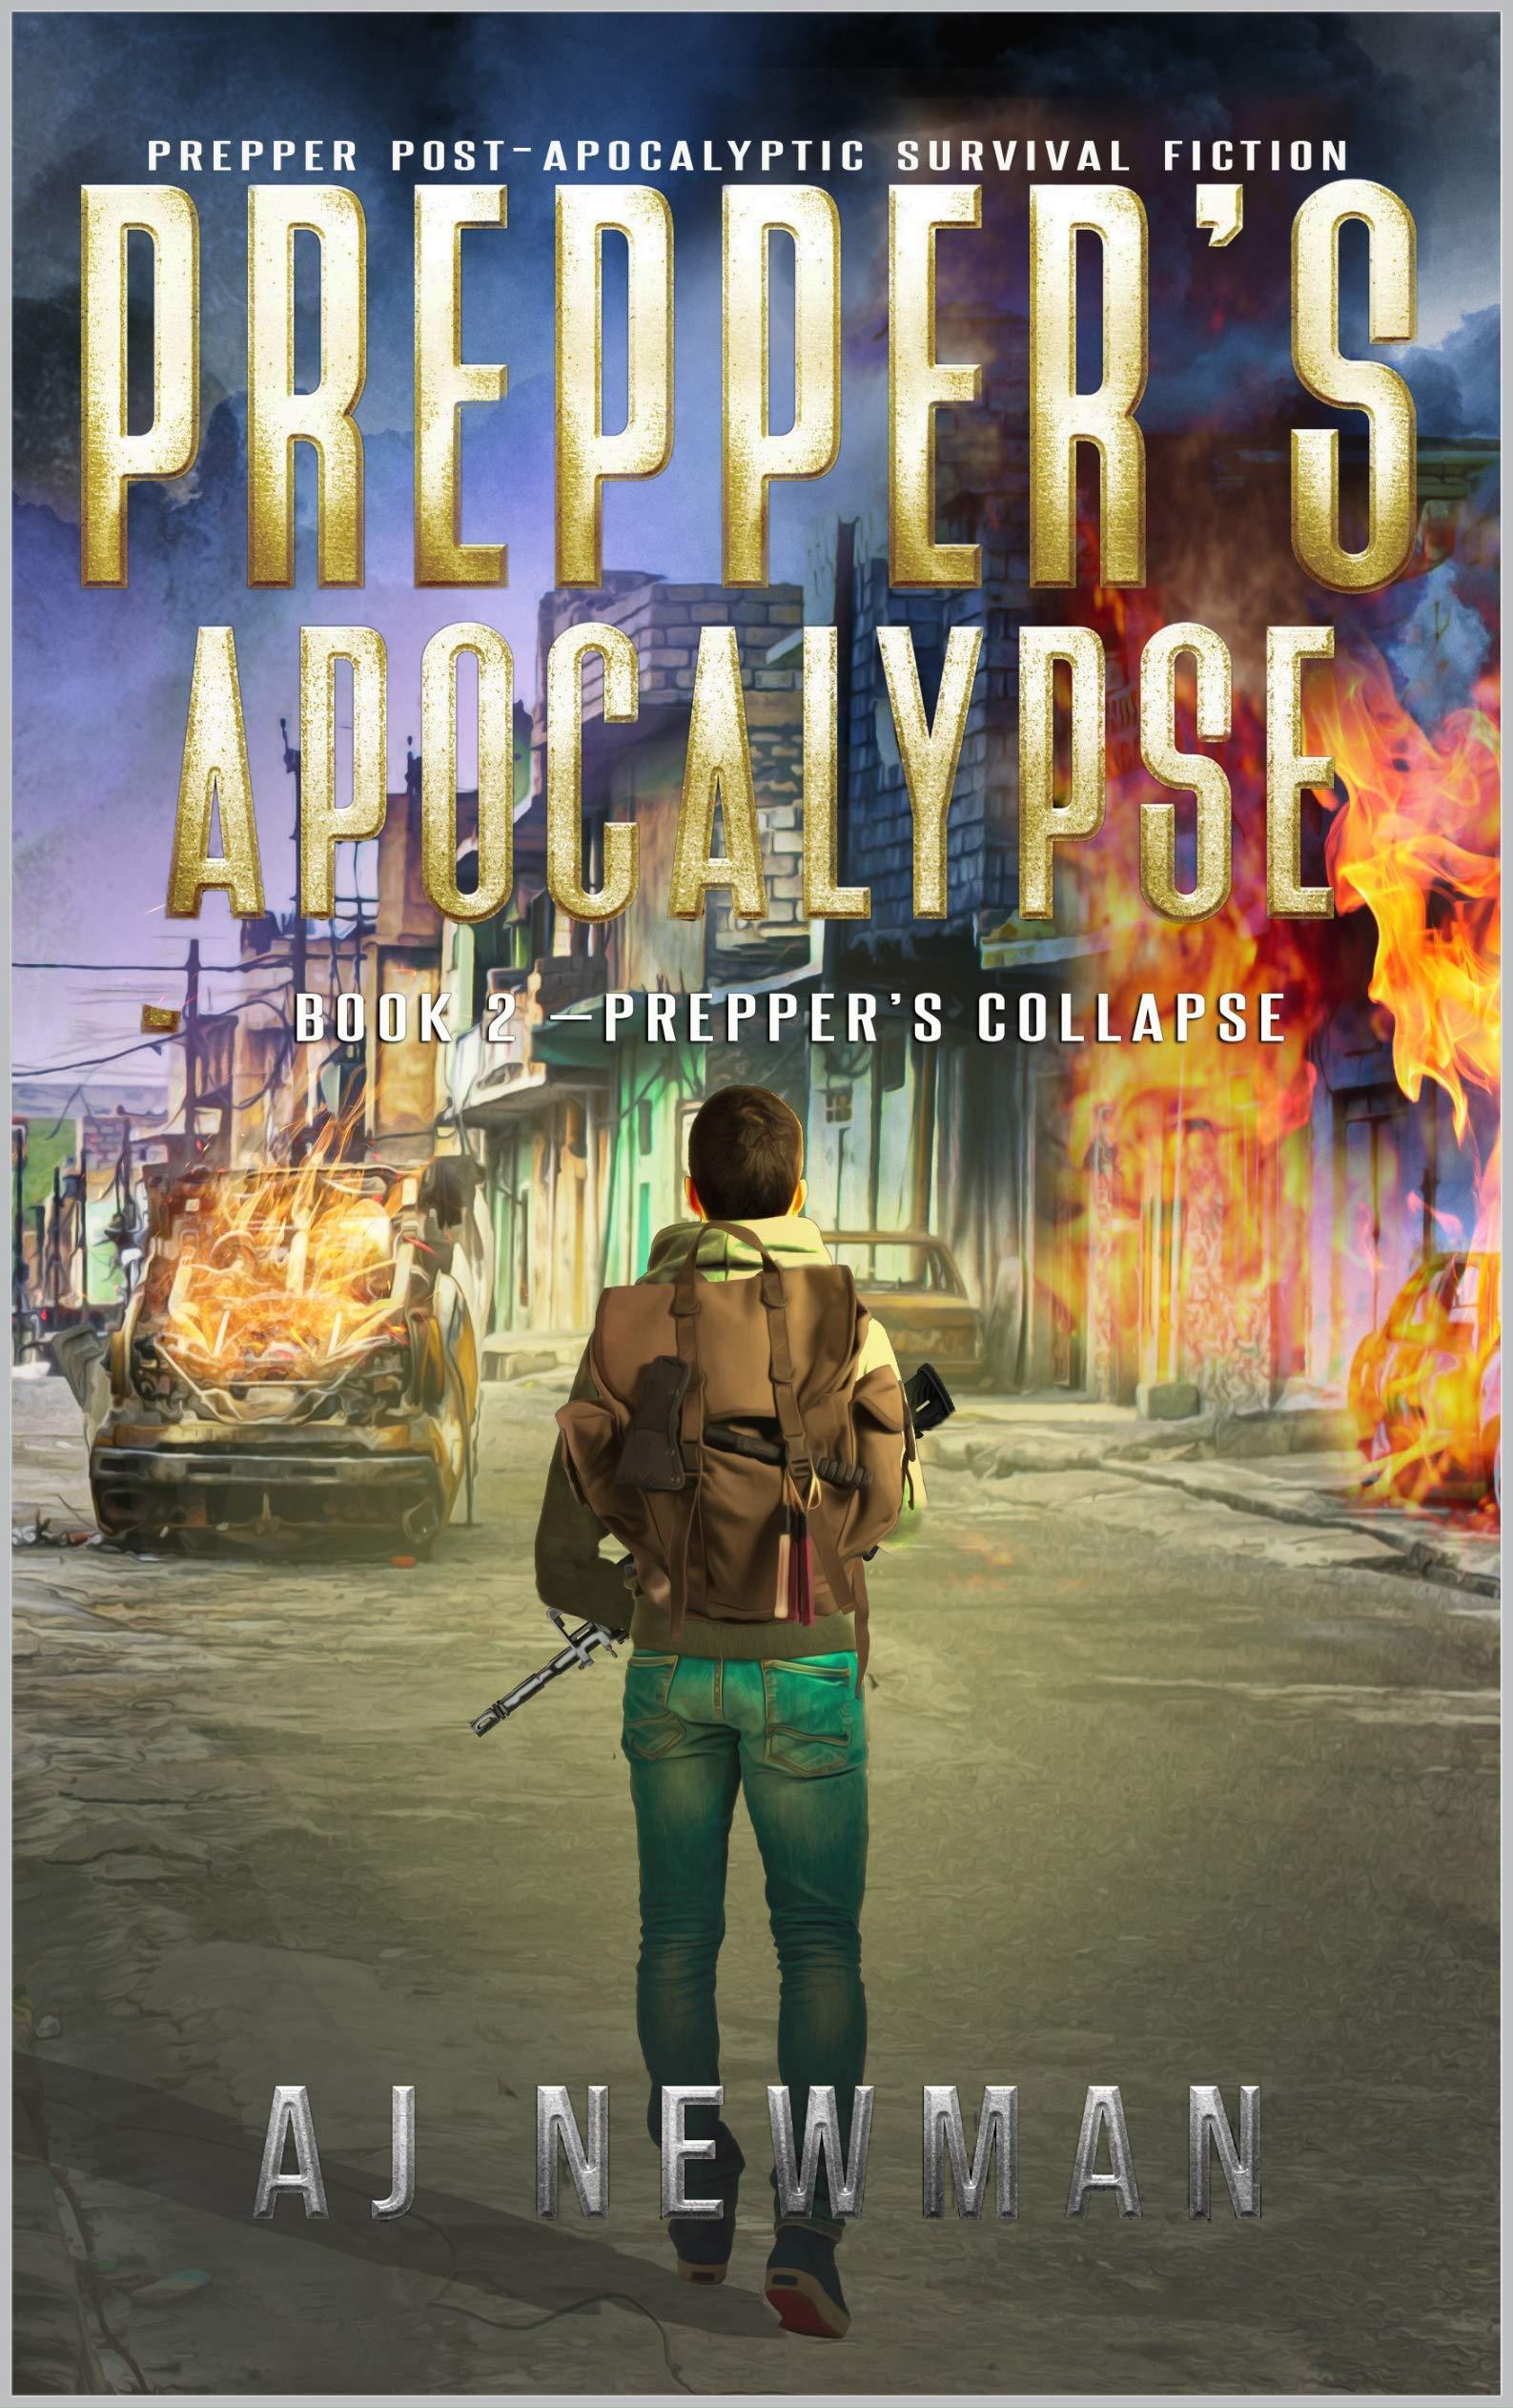 Prepper's Collapse: Prepper Post-Apocalyptic Survival Fiction (Prepper's Apocalypse Book 2)